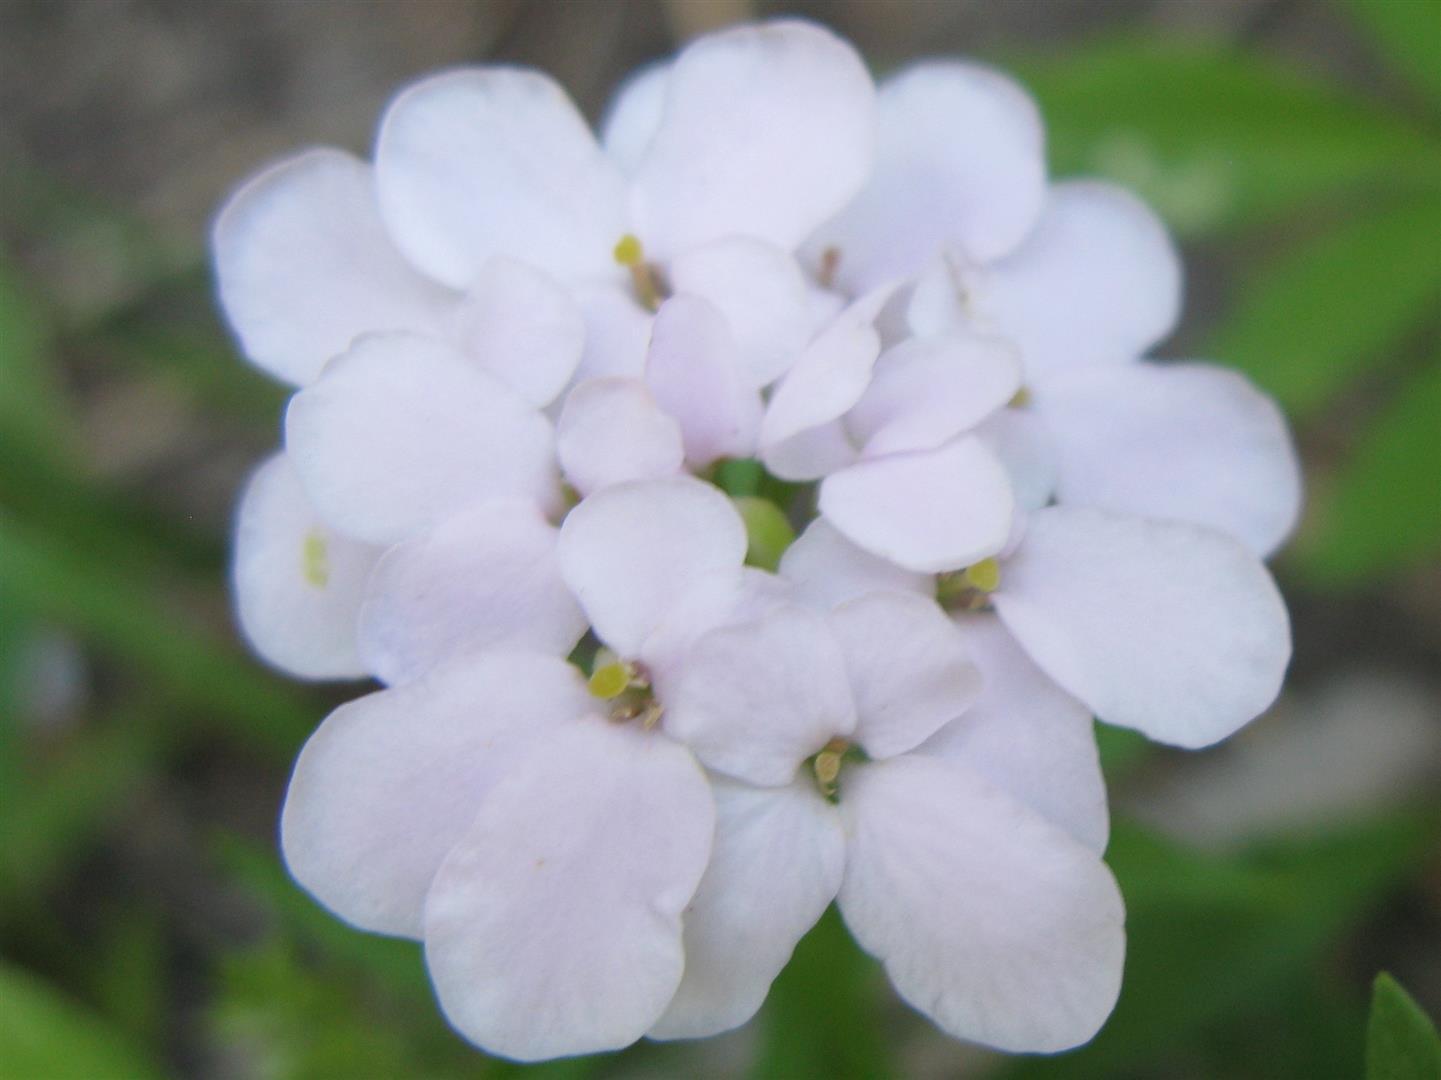 07-juillet-fleurs-2012-29-jpg